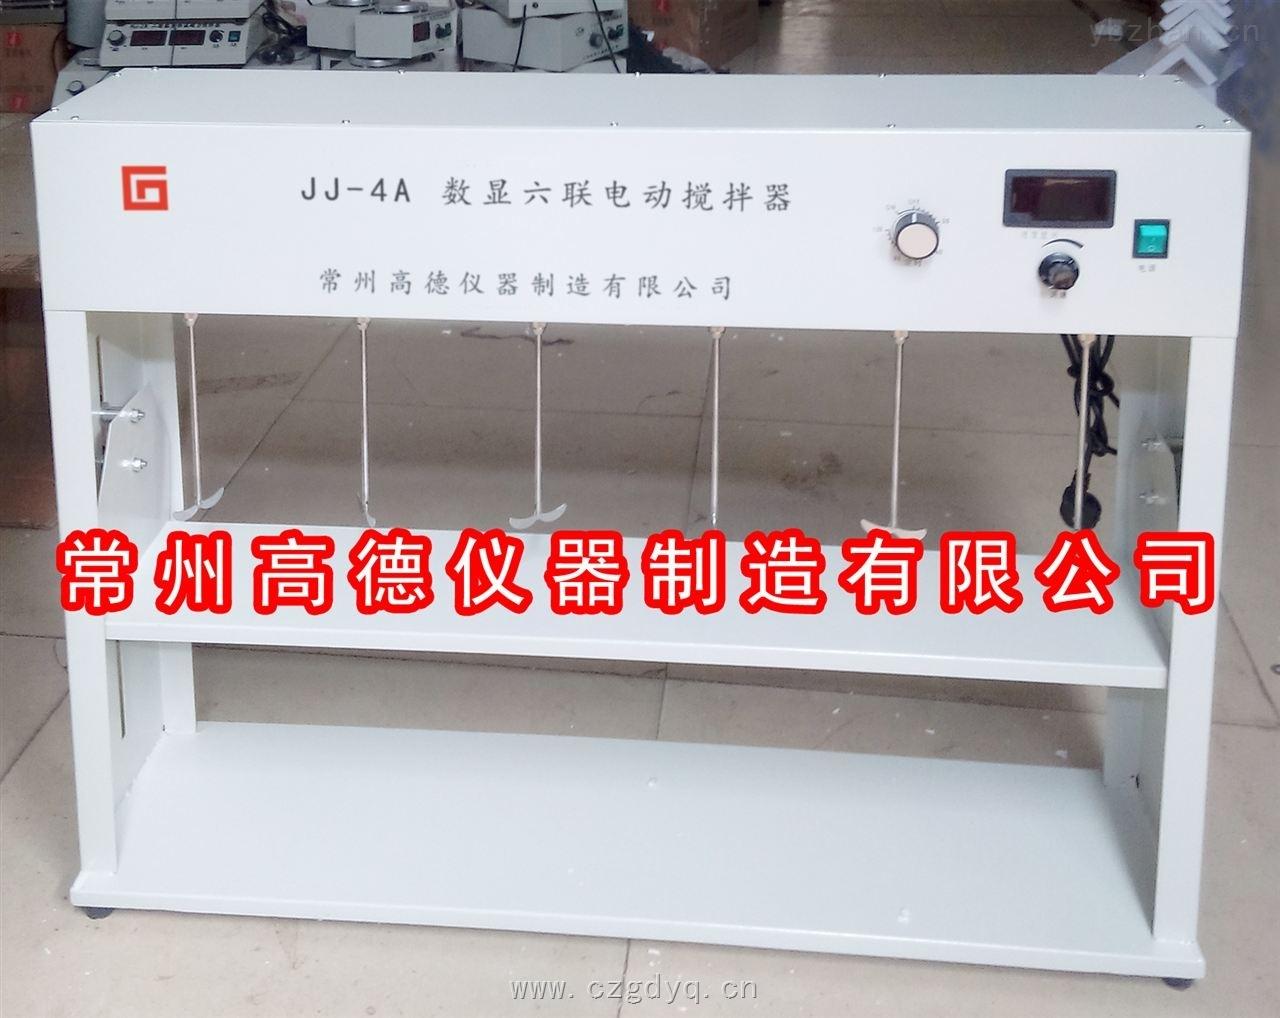 JJ-4A-数显六联同步电动搅拌器